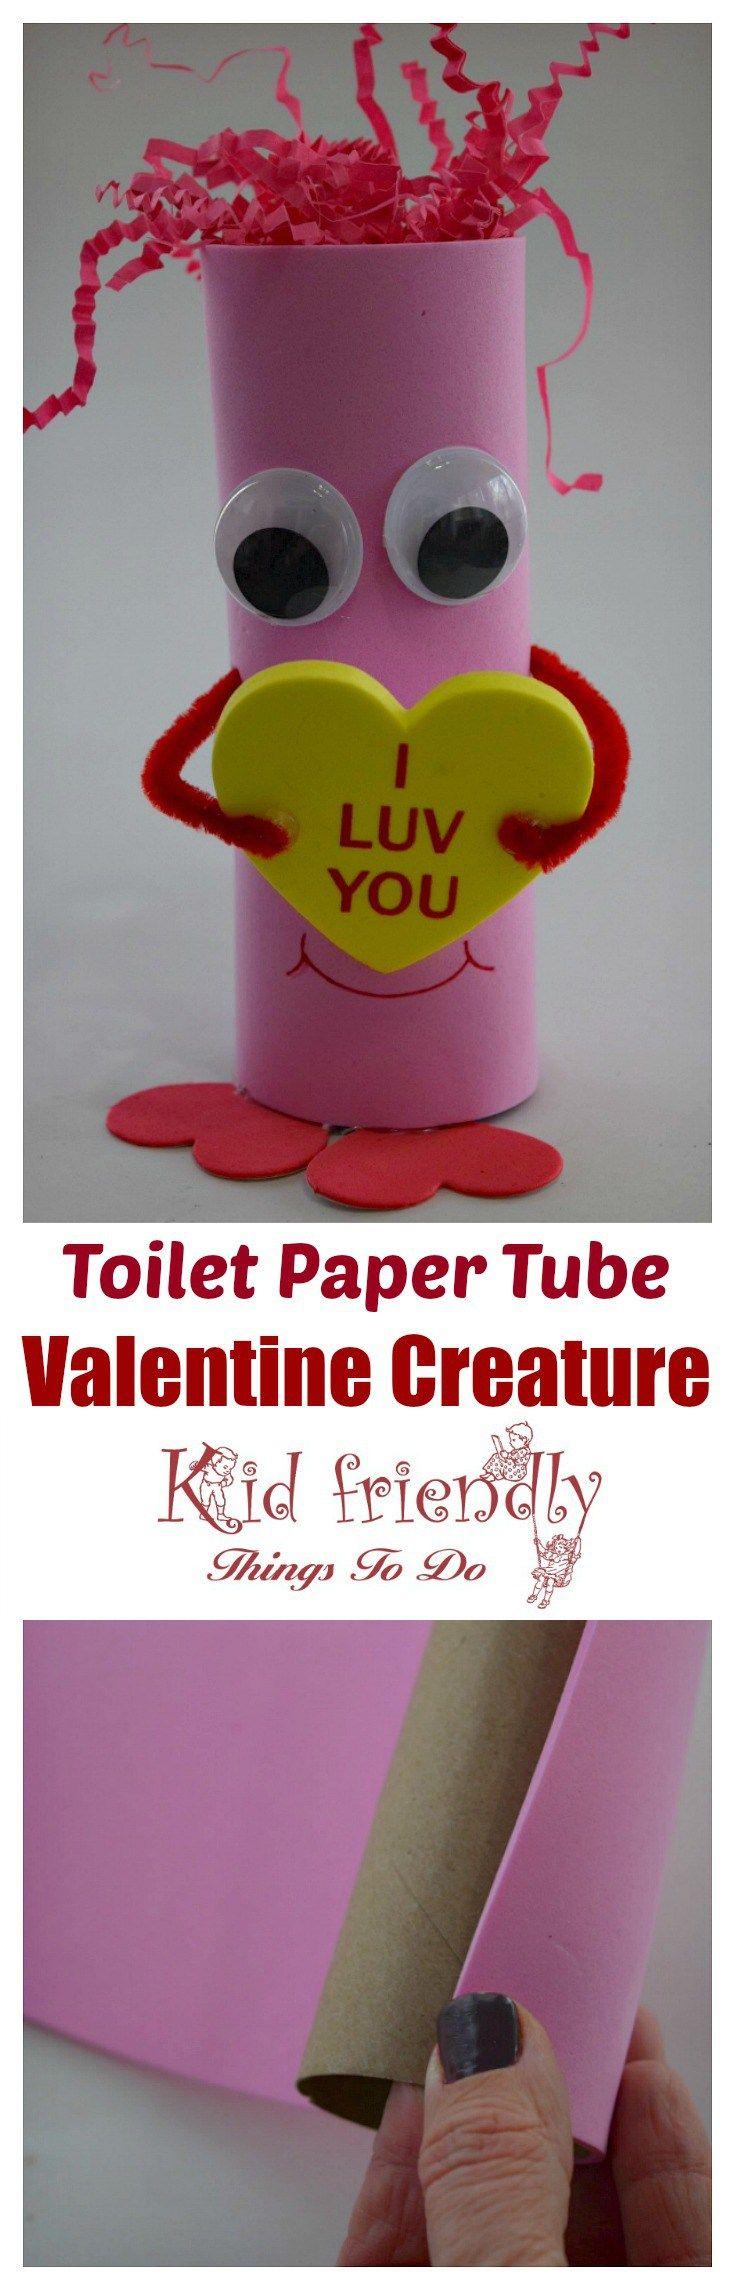 Preschool craft ideas for valentines day - Best 20 Valentine Day Crafts Ideas On Pinterest Valentine S Day Diy Valentines Day Hearts And Boyfriend Day